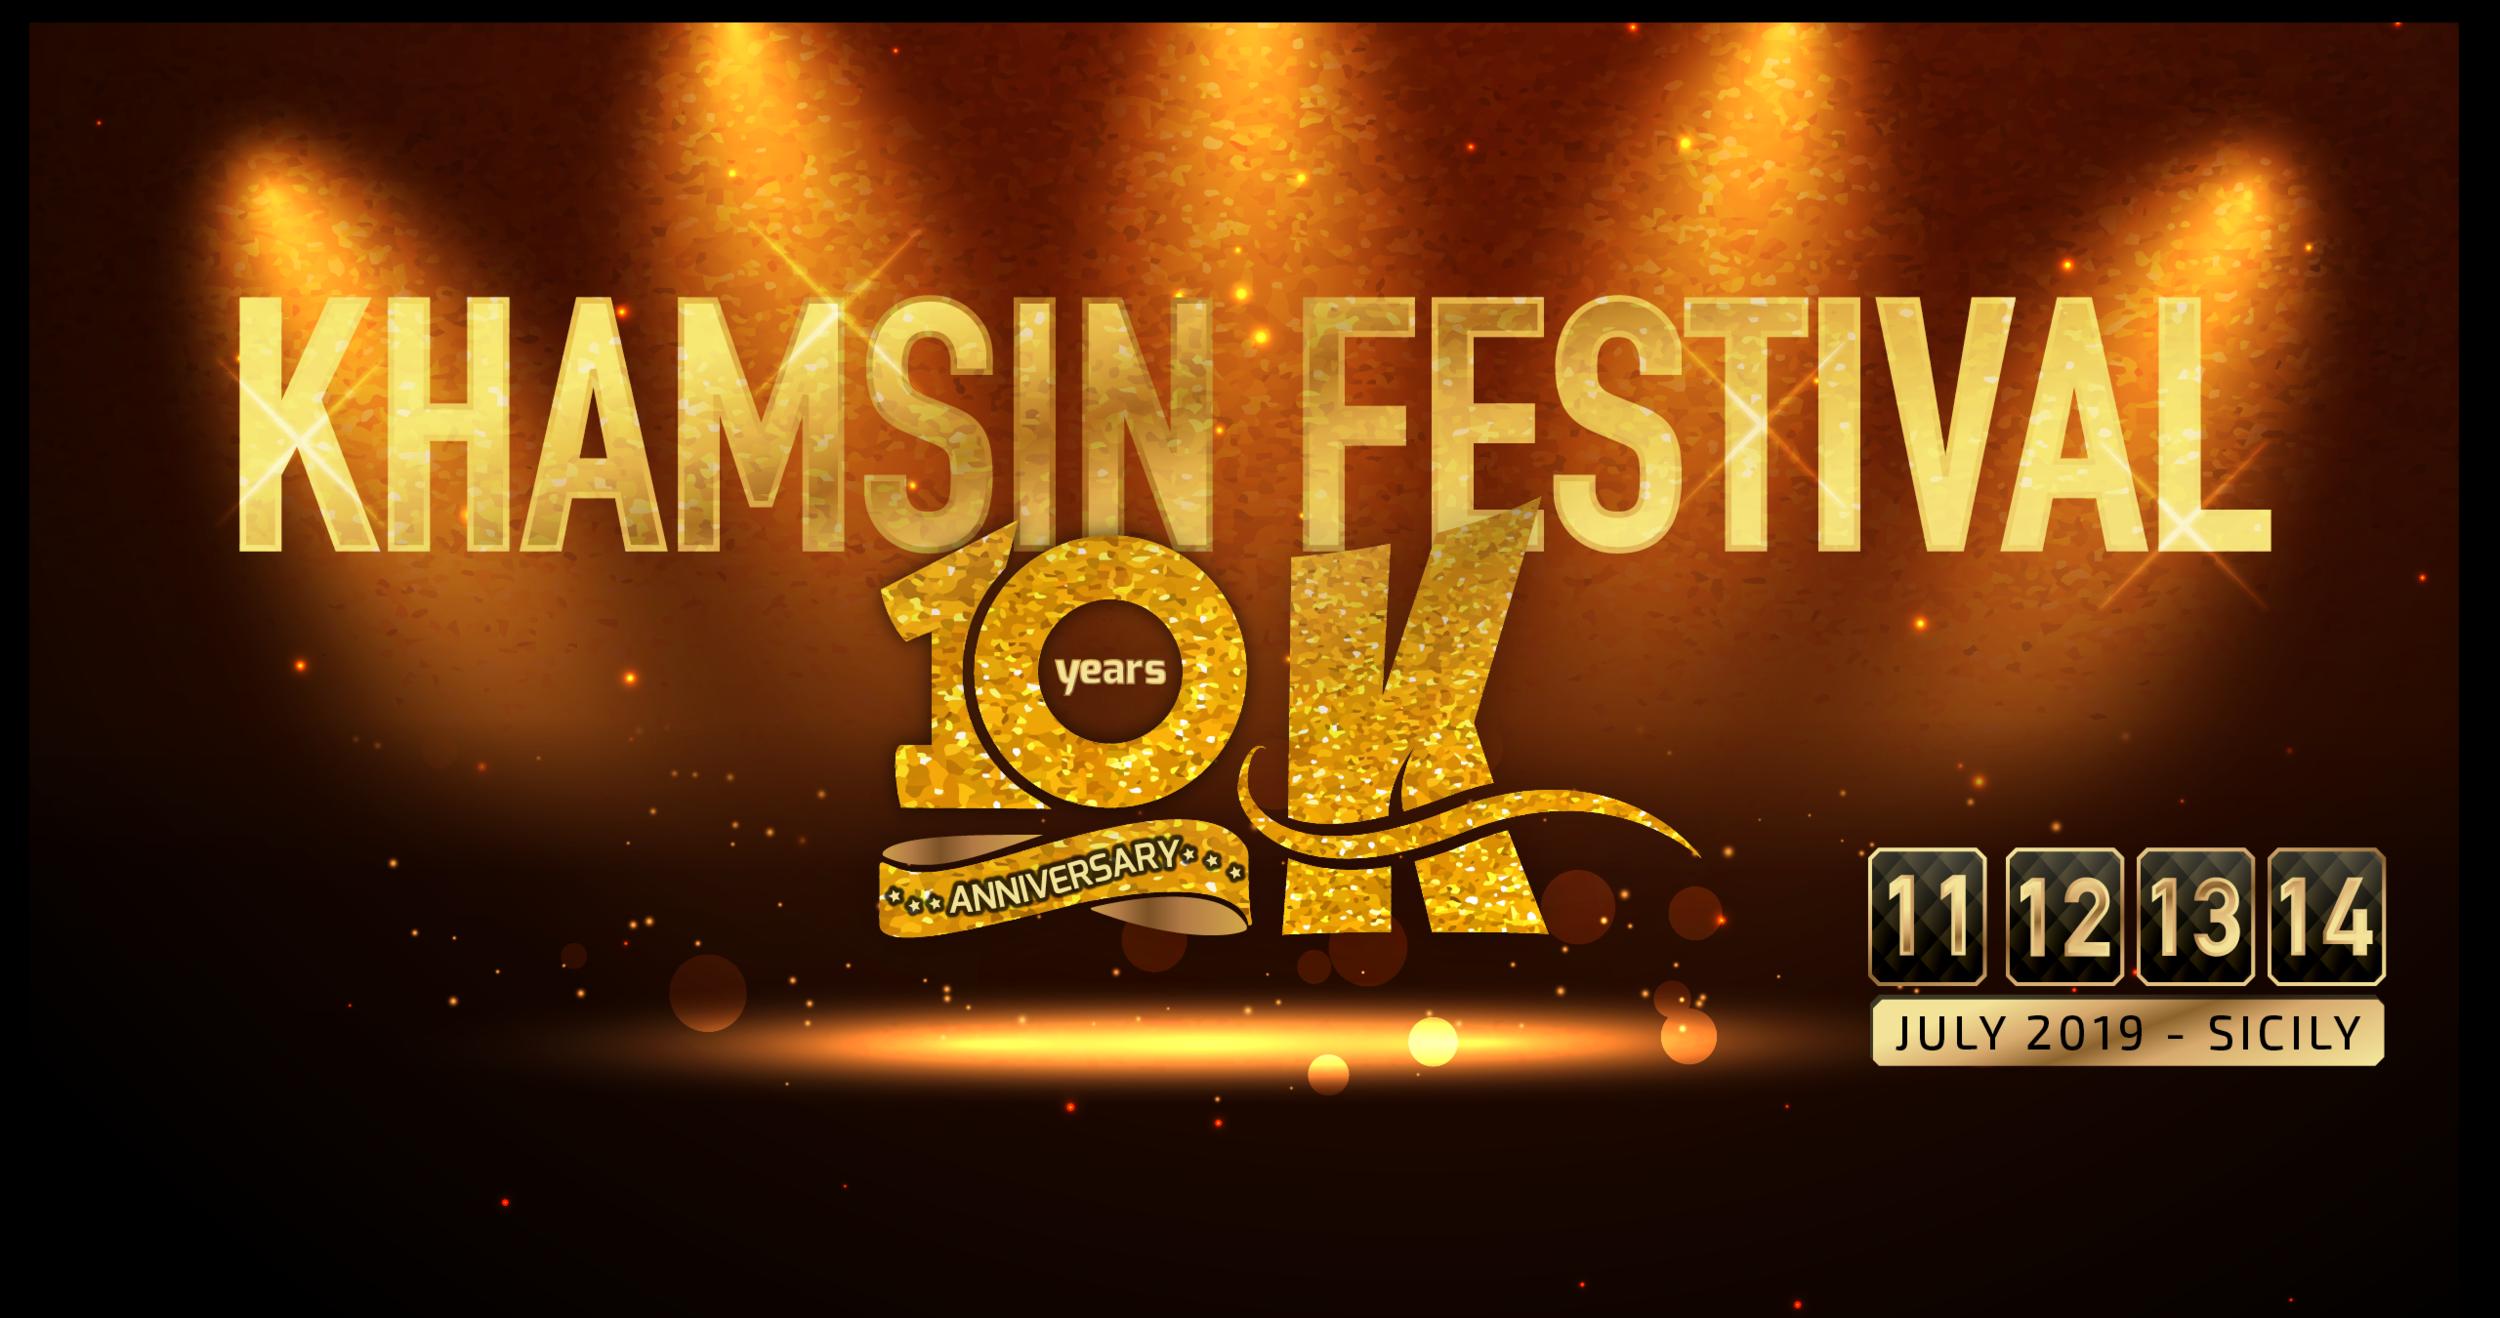 khamsin-festival-logo.png